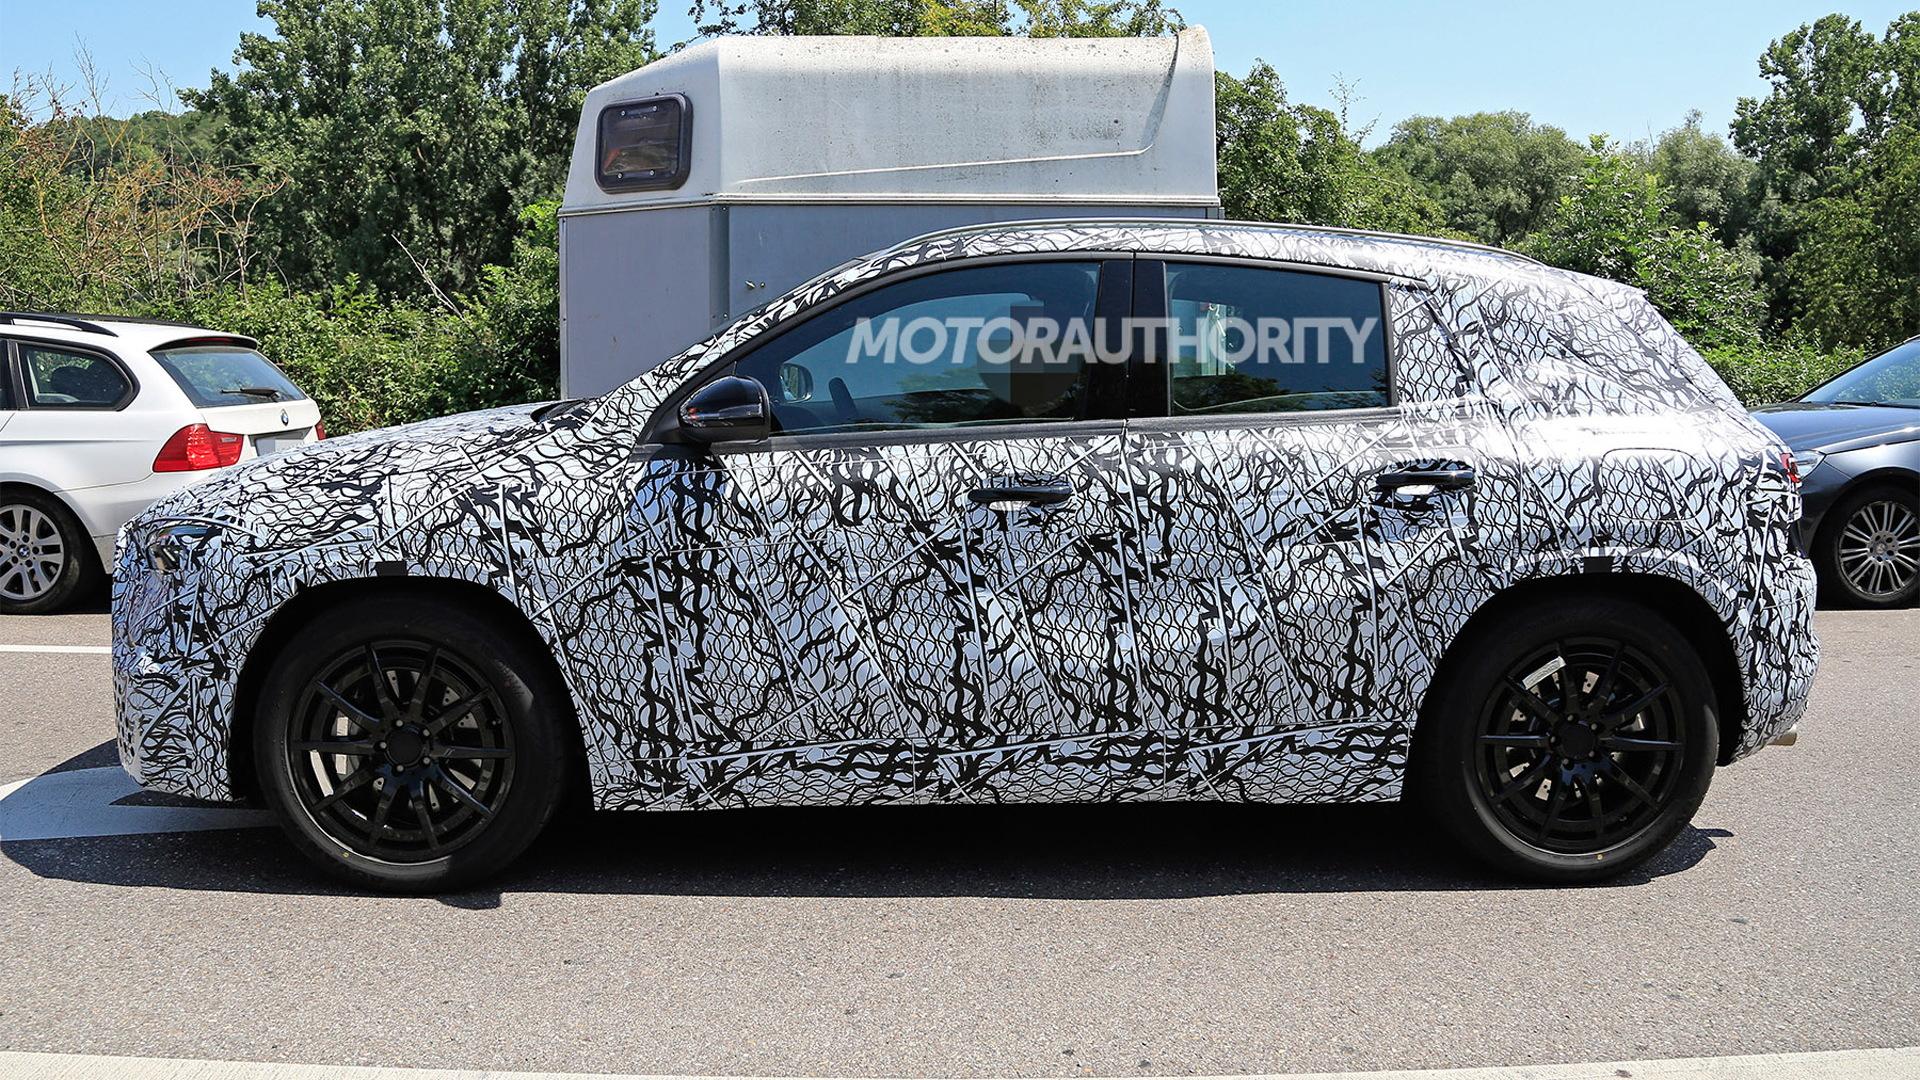 2021 Mercedes-AMG GLA45 spy shots - Photo credit: S. Baldauf/SB-Medien